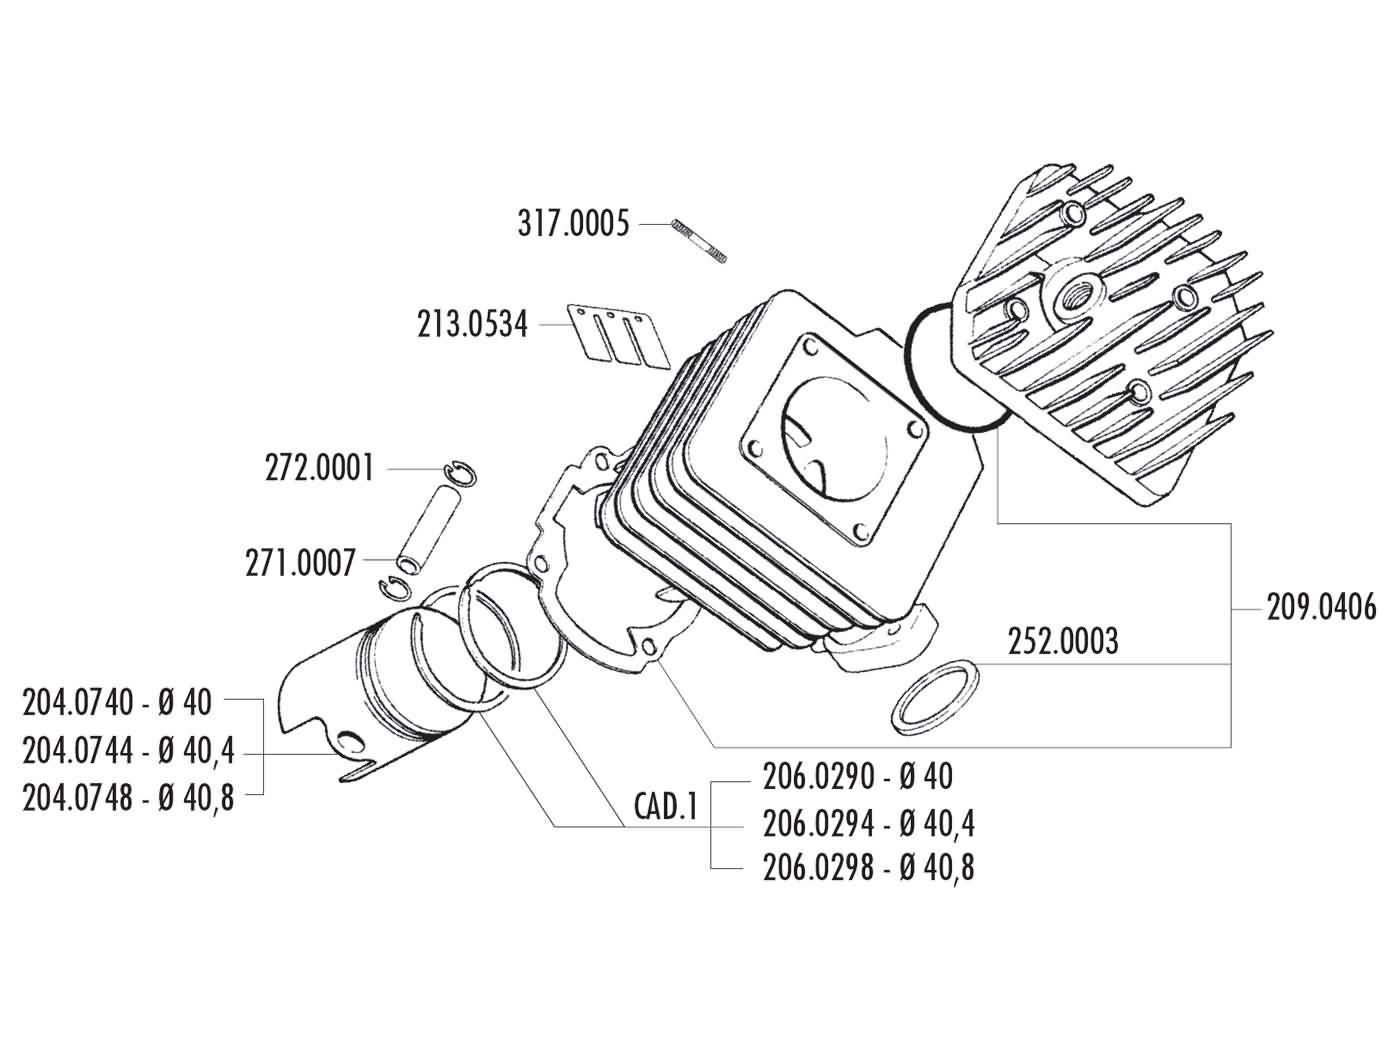 hight resolution of piston kit polini 50cc 40 4mm for peugeot vertical back polini polini 50cc engine diagram